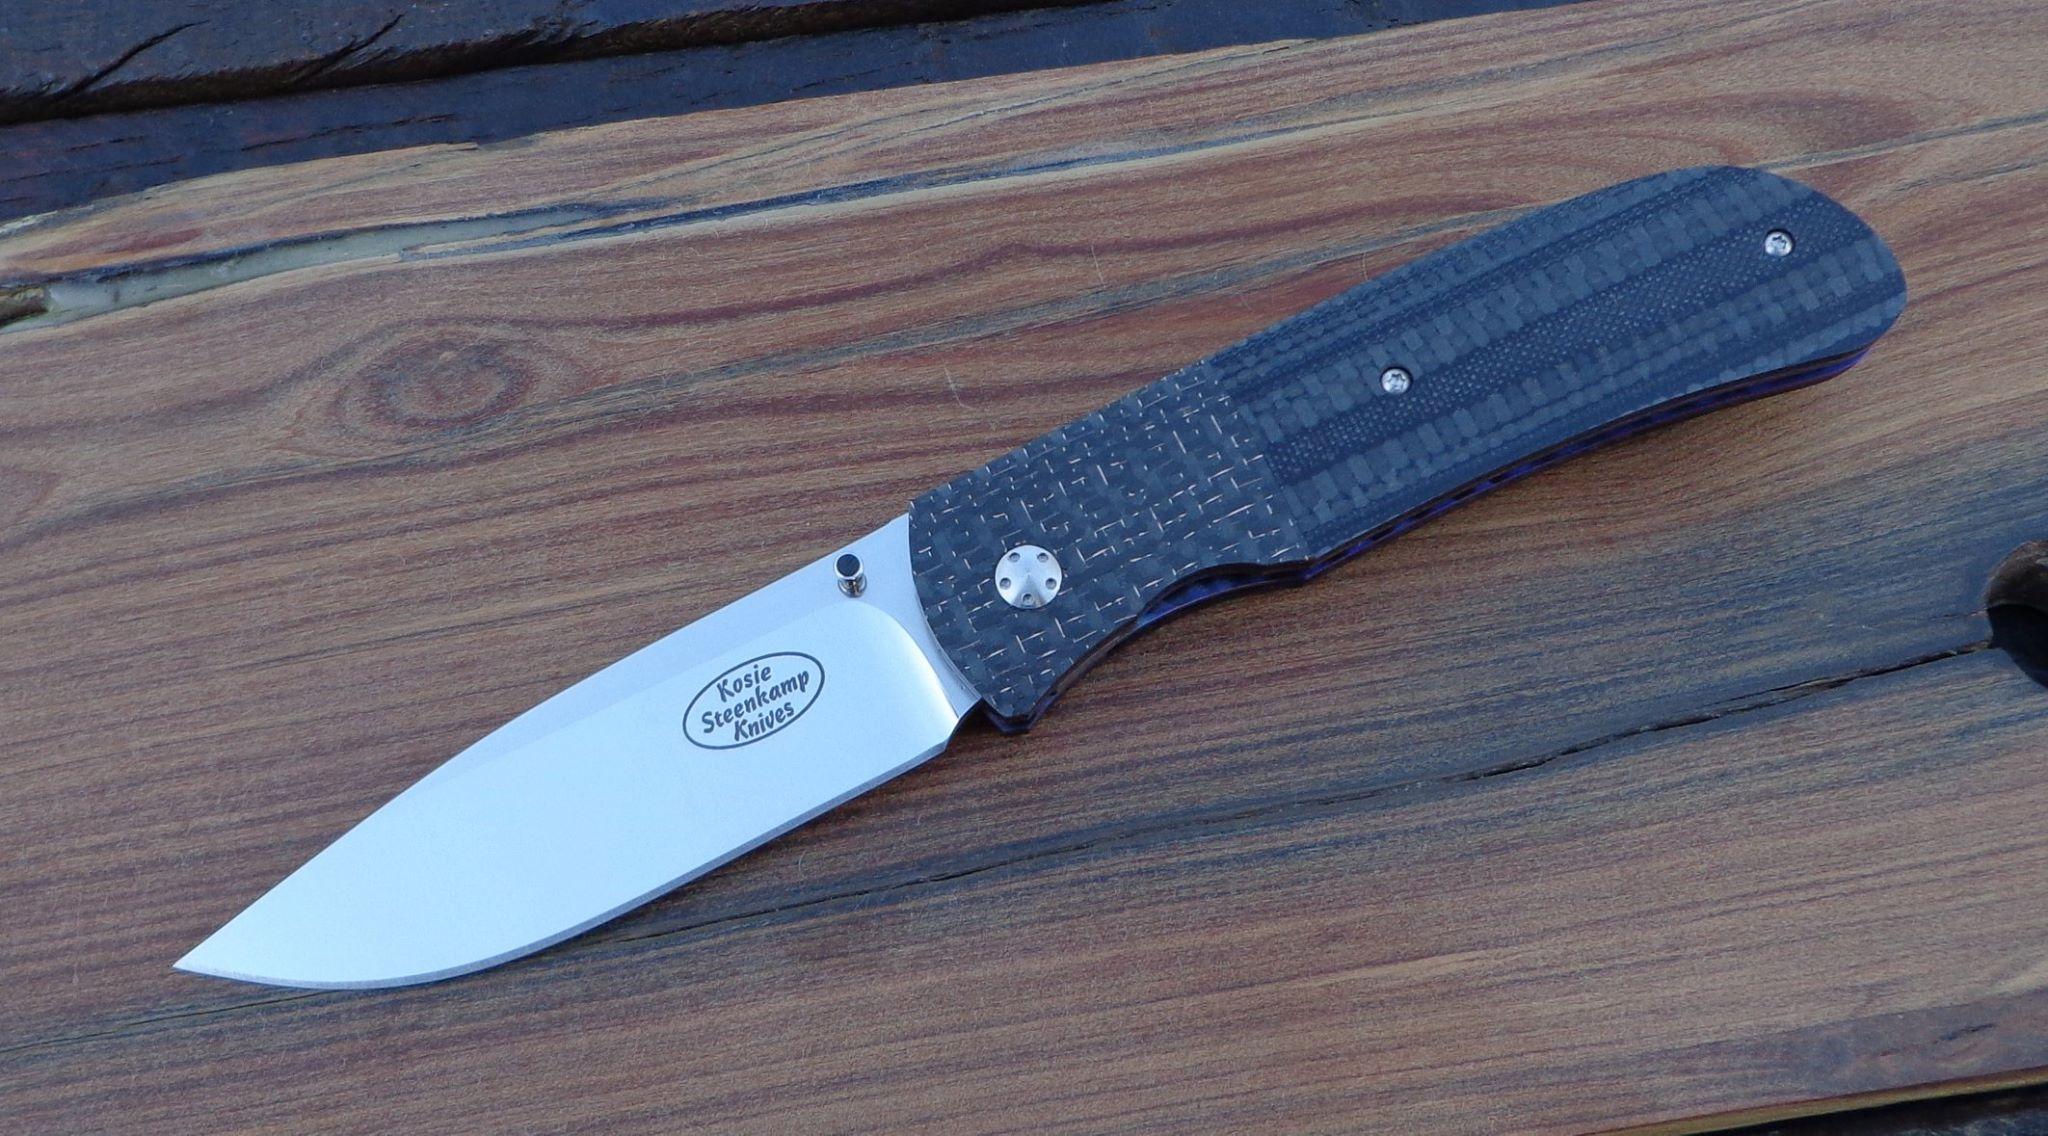 Knife: Hanson. Blade: Böhler N690 Stainless Steel. Liners: Titanium, anodized blue. Handle scales: G10 + Carbon Fibre and Lightning Strike Carbon Fibre with anodized Titanium belt clip.